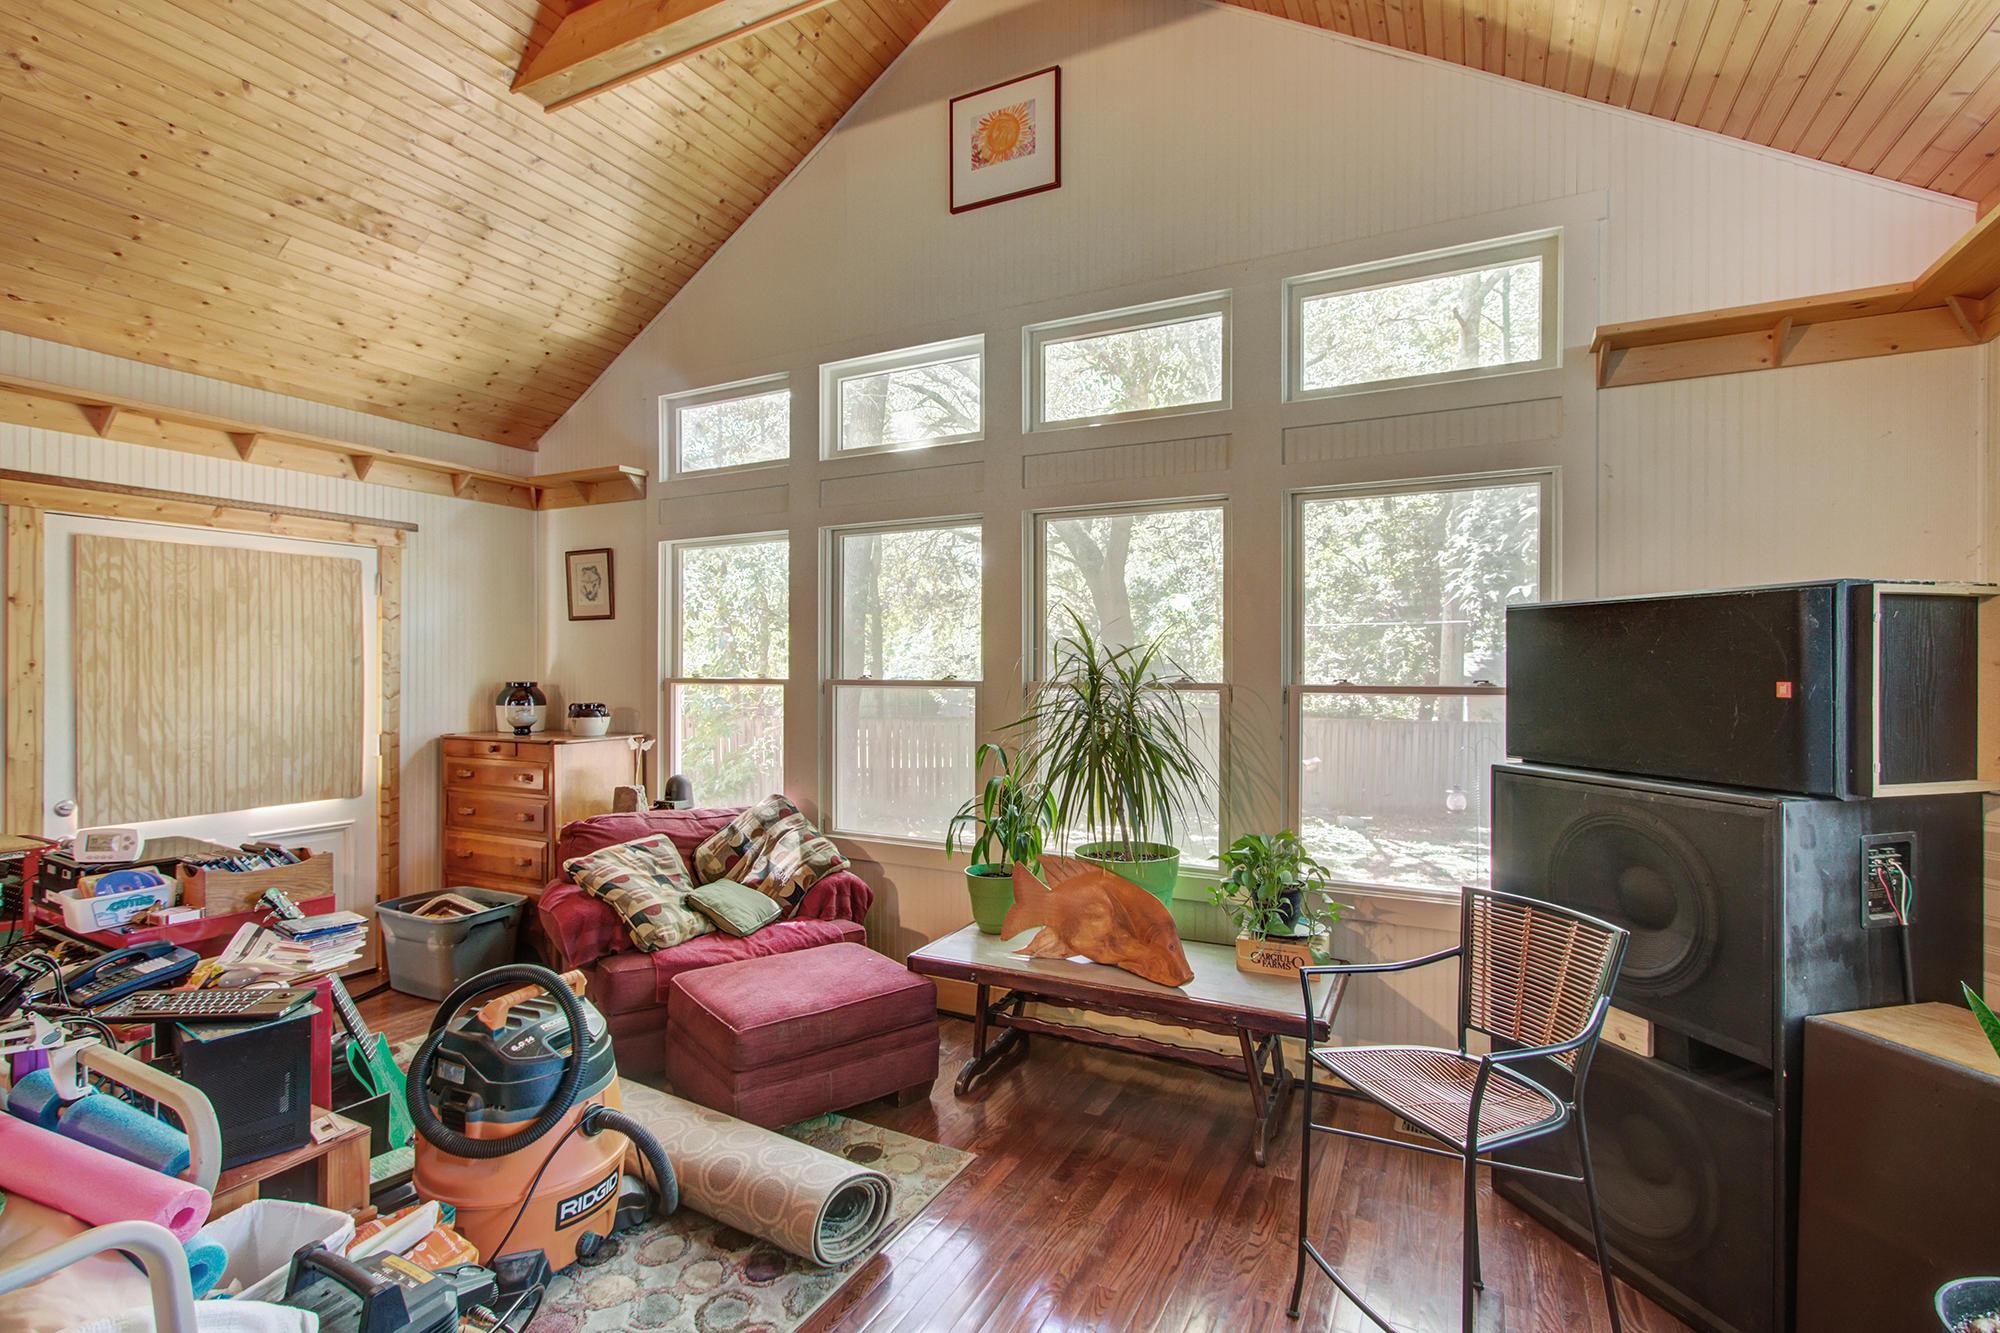 Wando Lakes Homes For Sale - 858 Fairlawn, Mount Pleasant, SC - 25